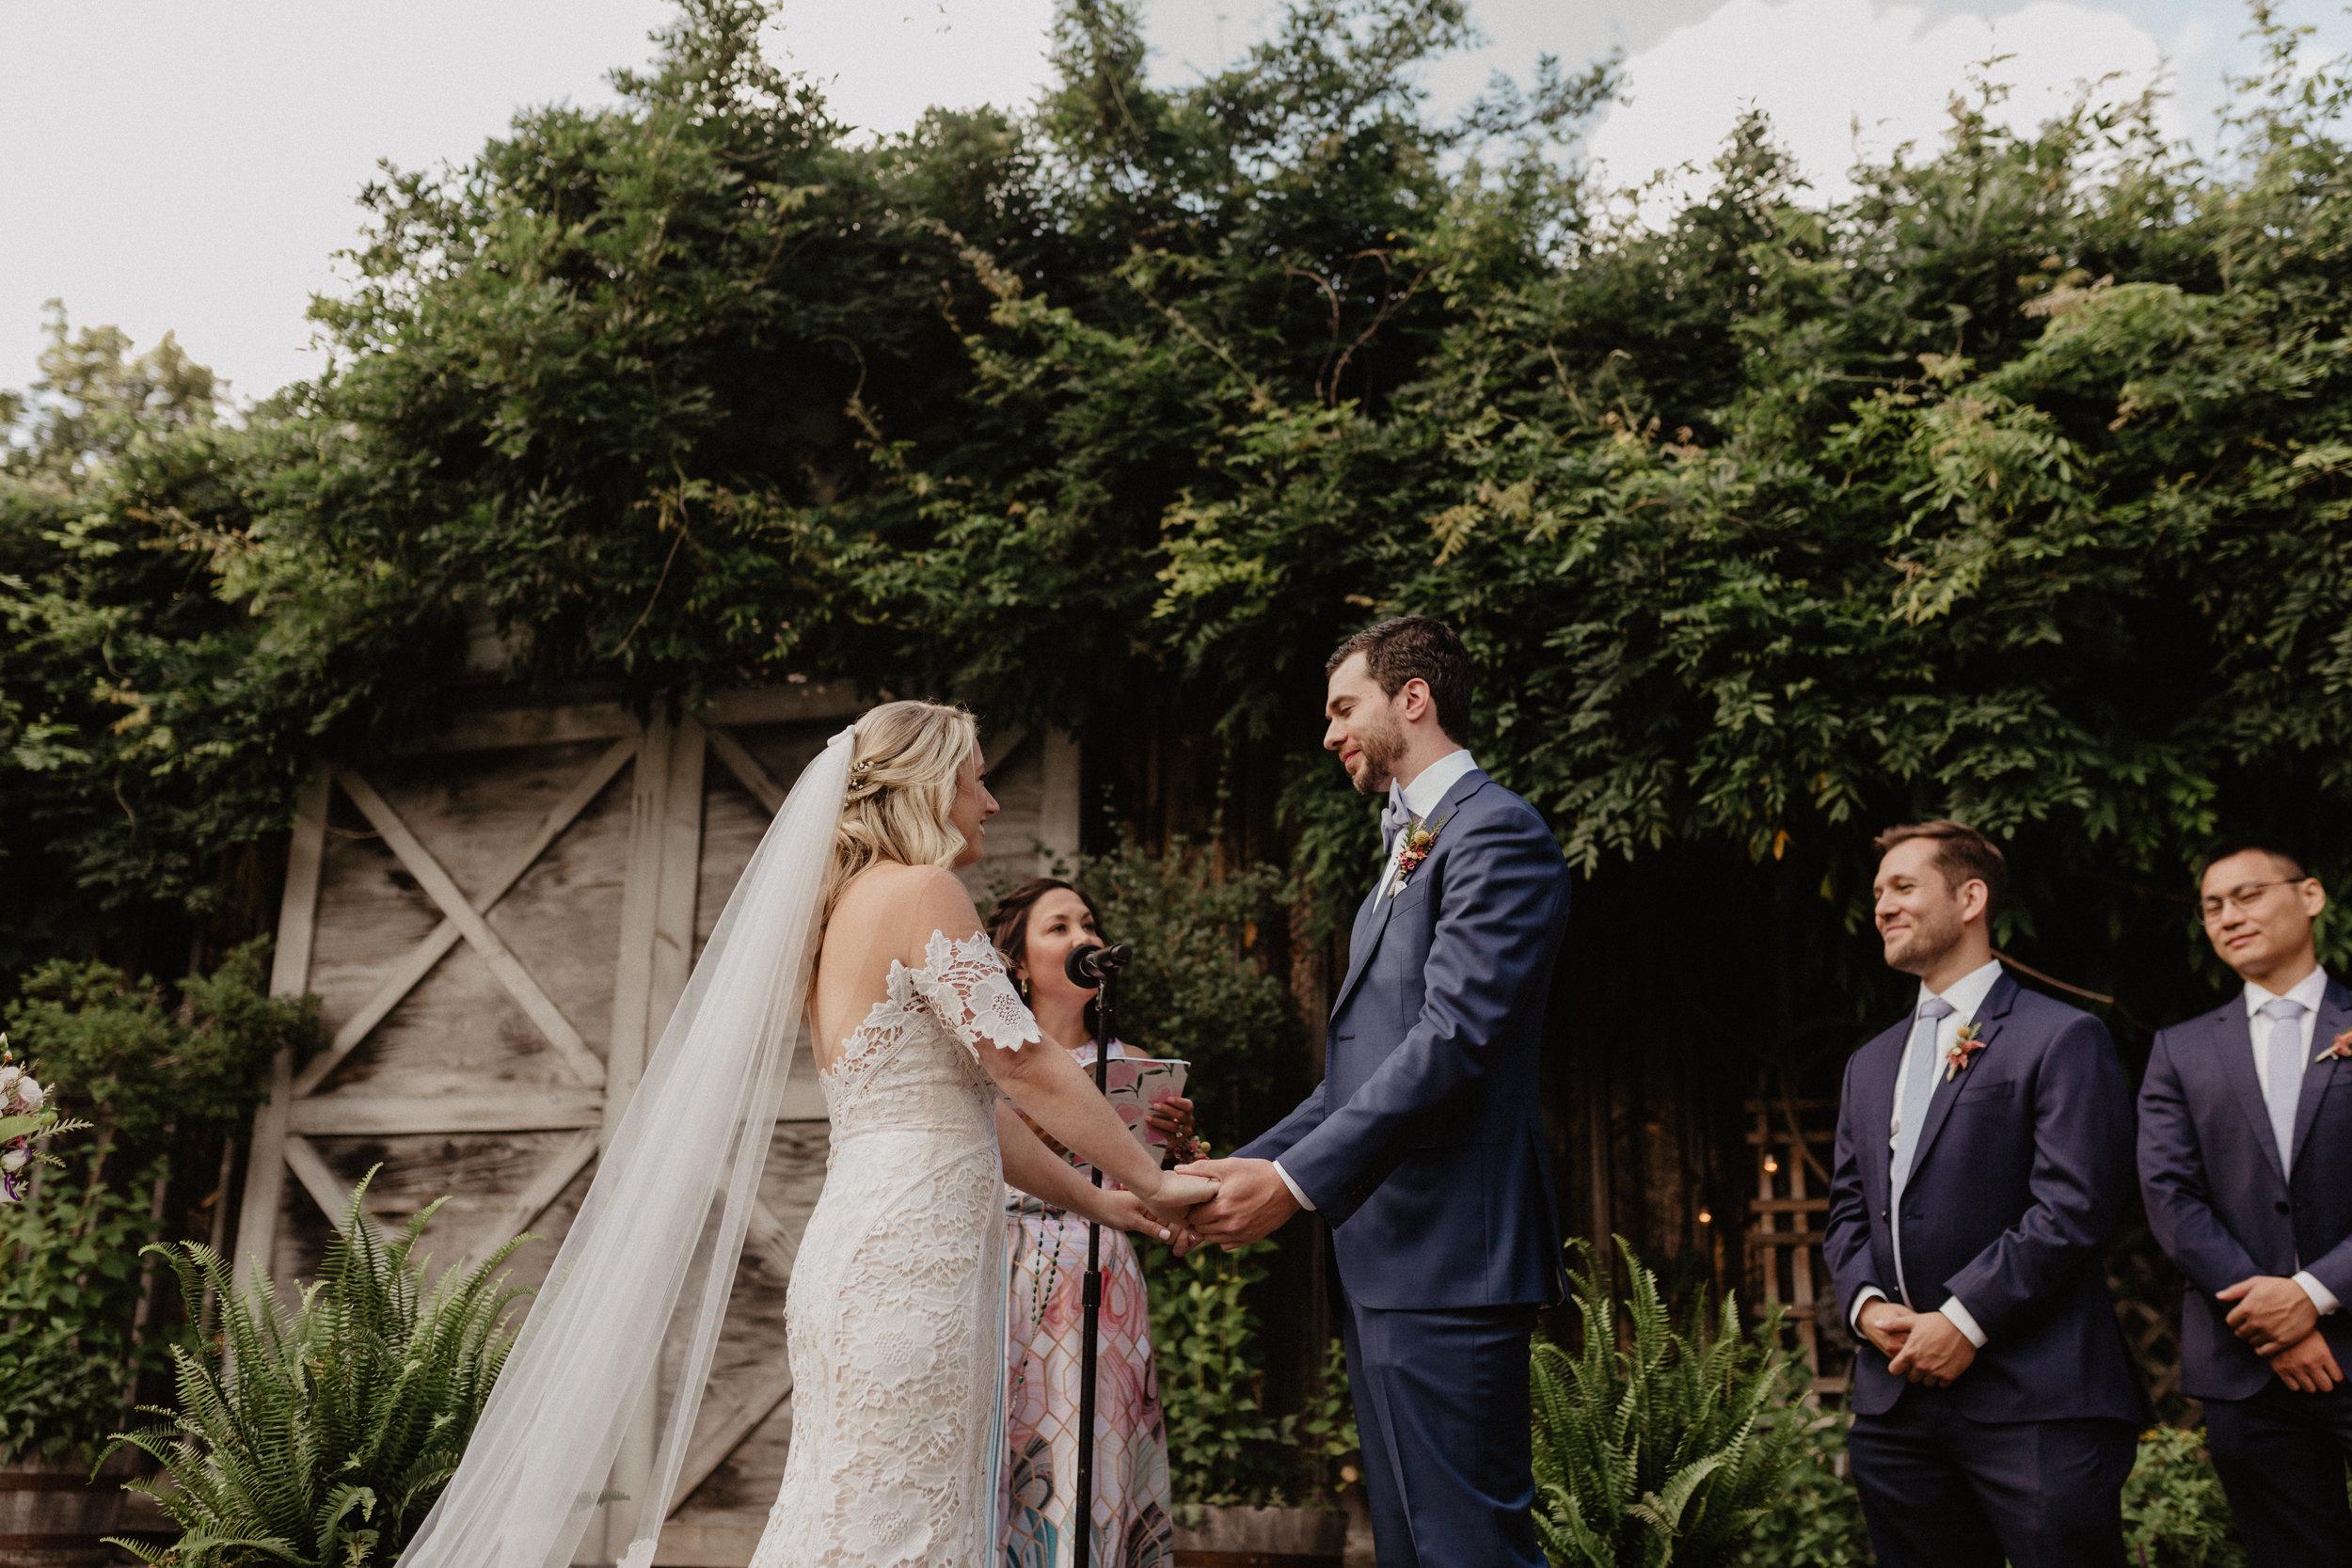 m-and-d-farm-wedding-67.jpg